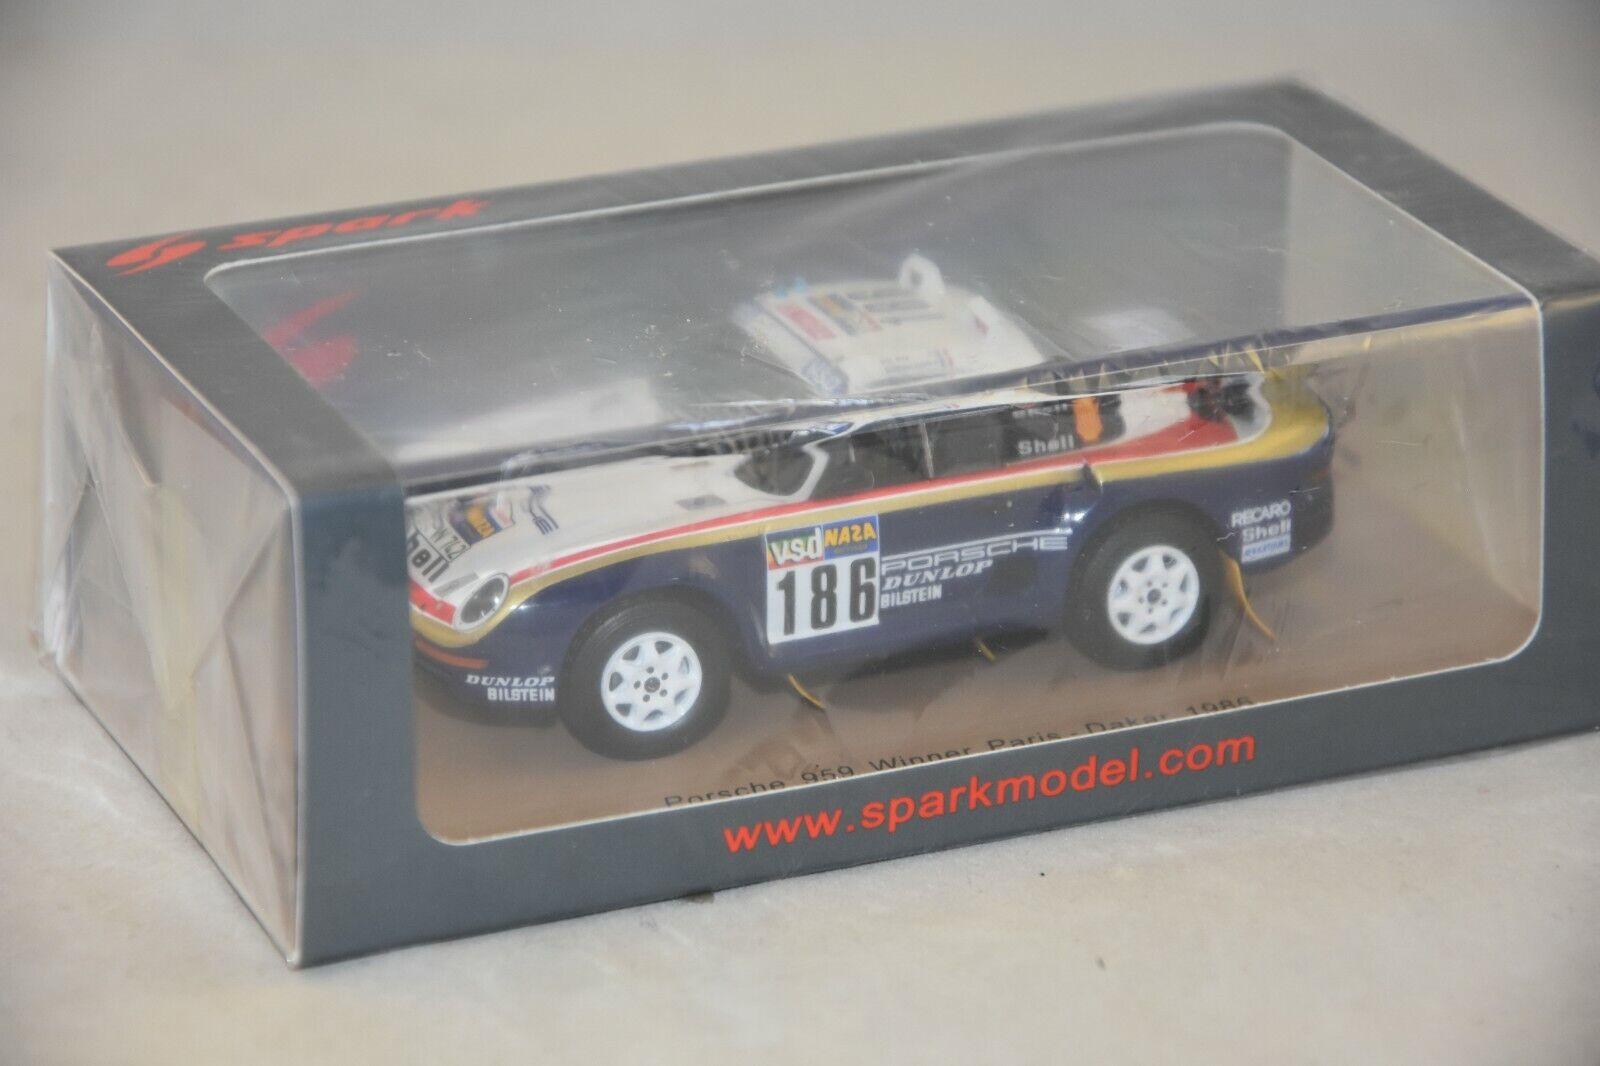 Spark s7815-porsche  959 nº 186 winner rally paris dakar metge 1986 1 43  beaucoup de surprises